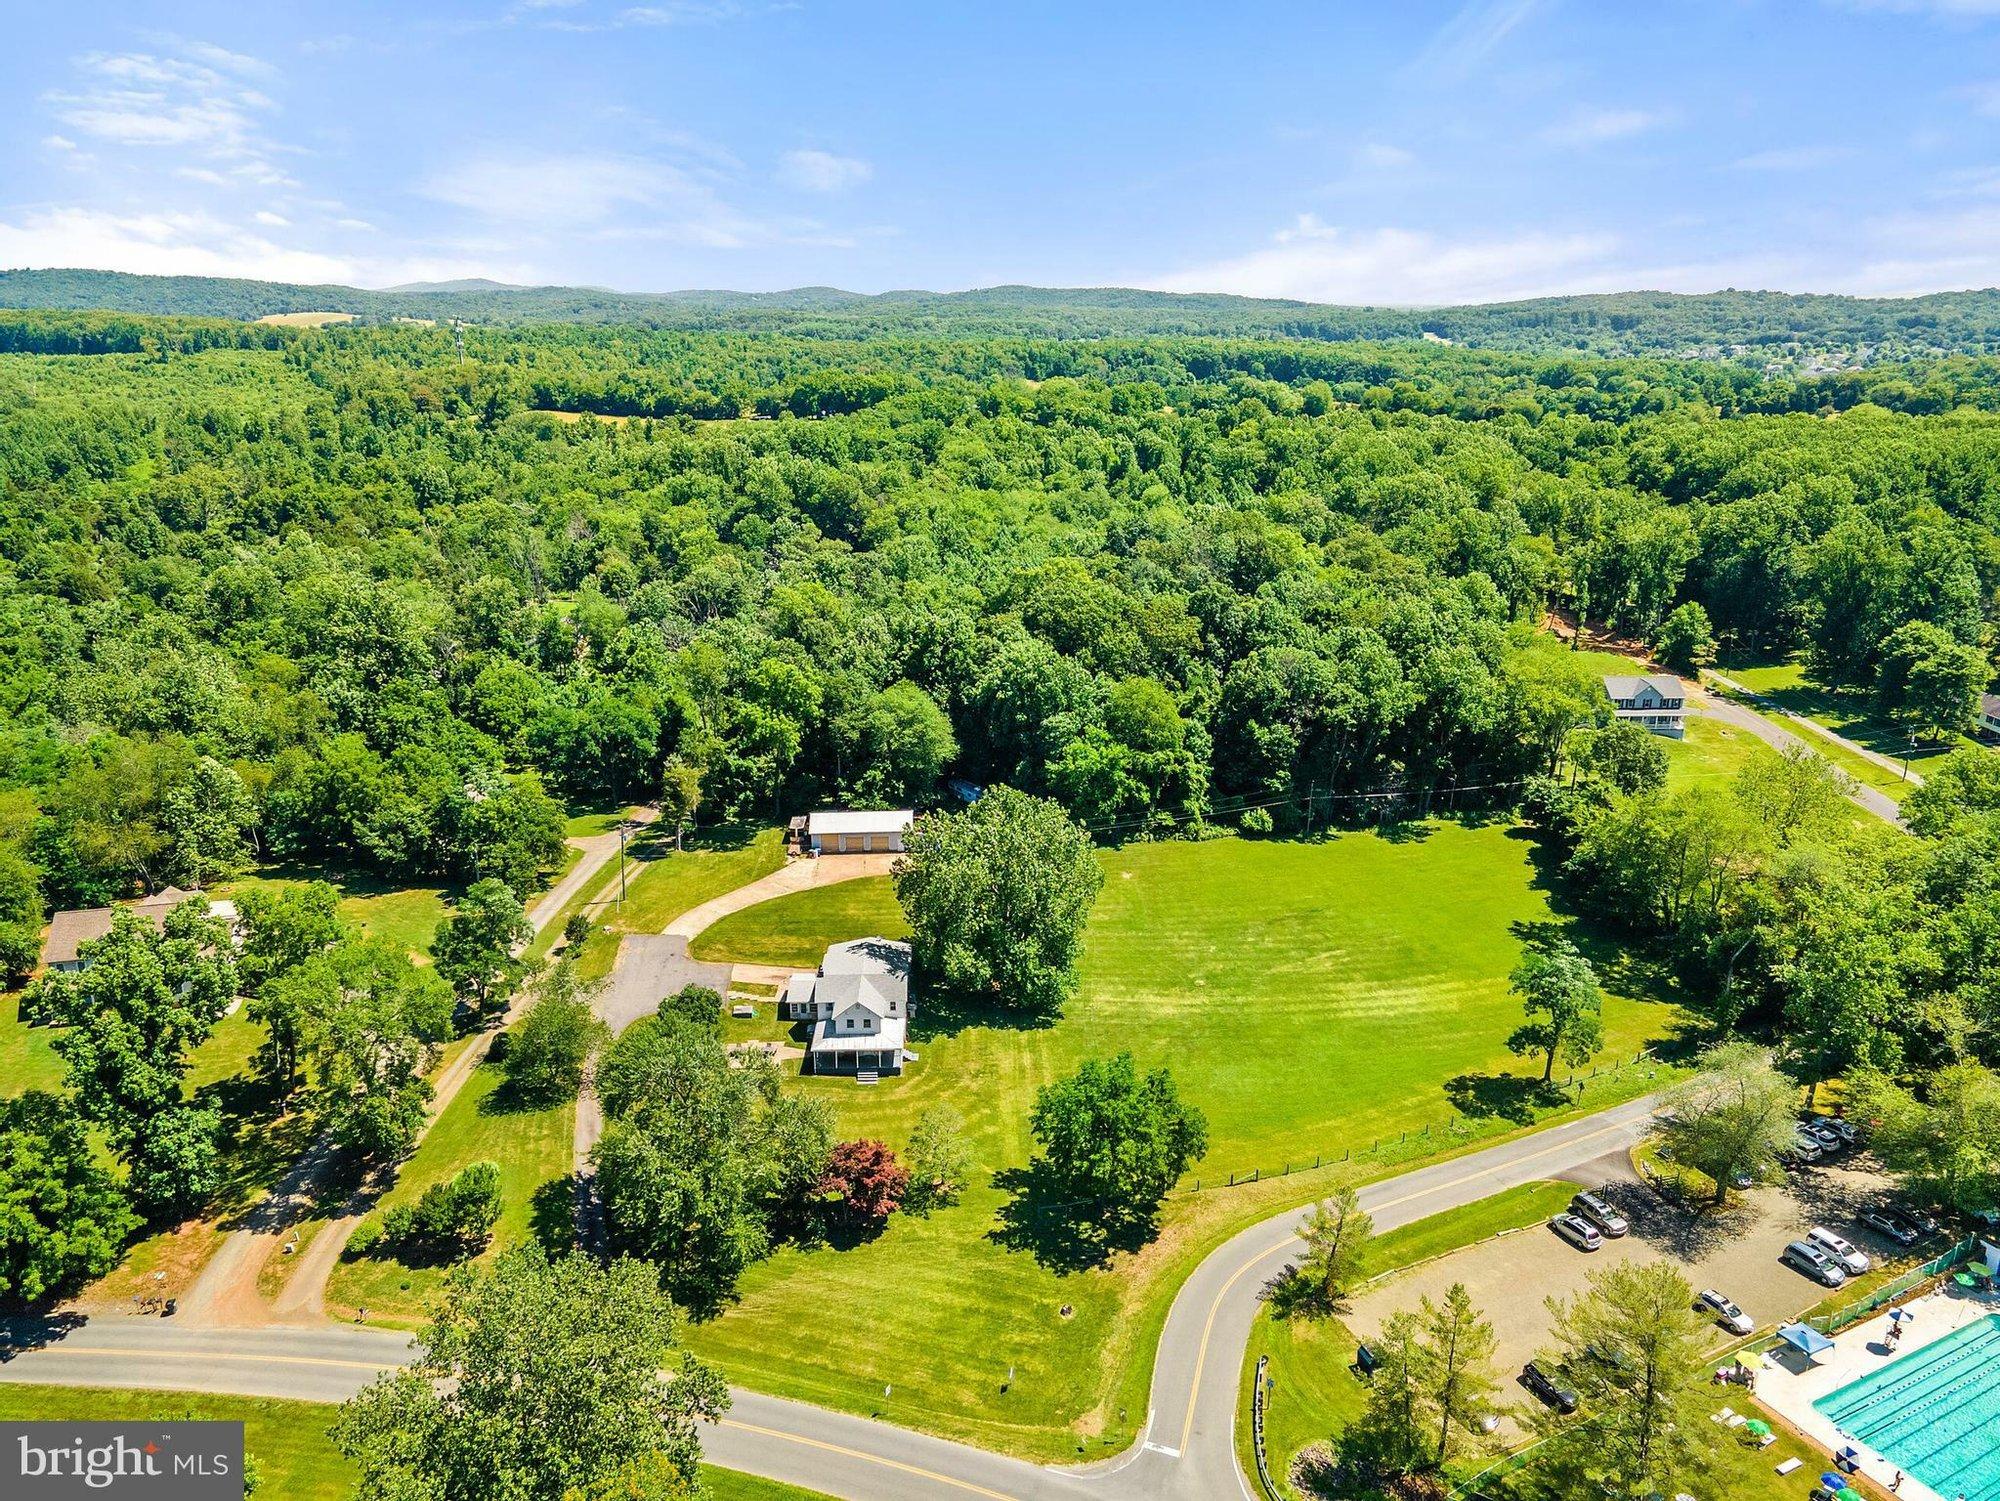 Land in Warrenton, Virginia, United States 1 - 11525522